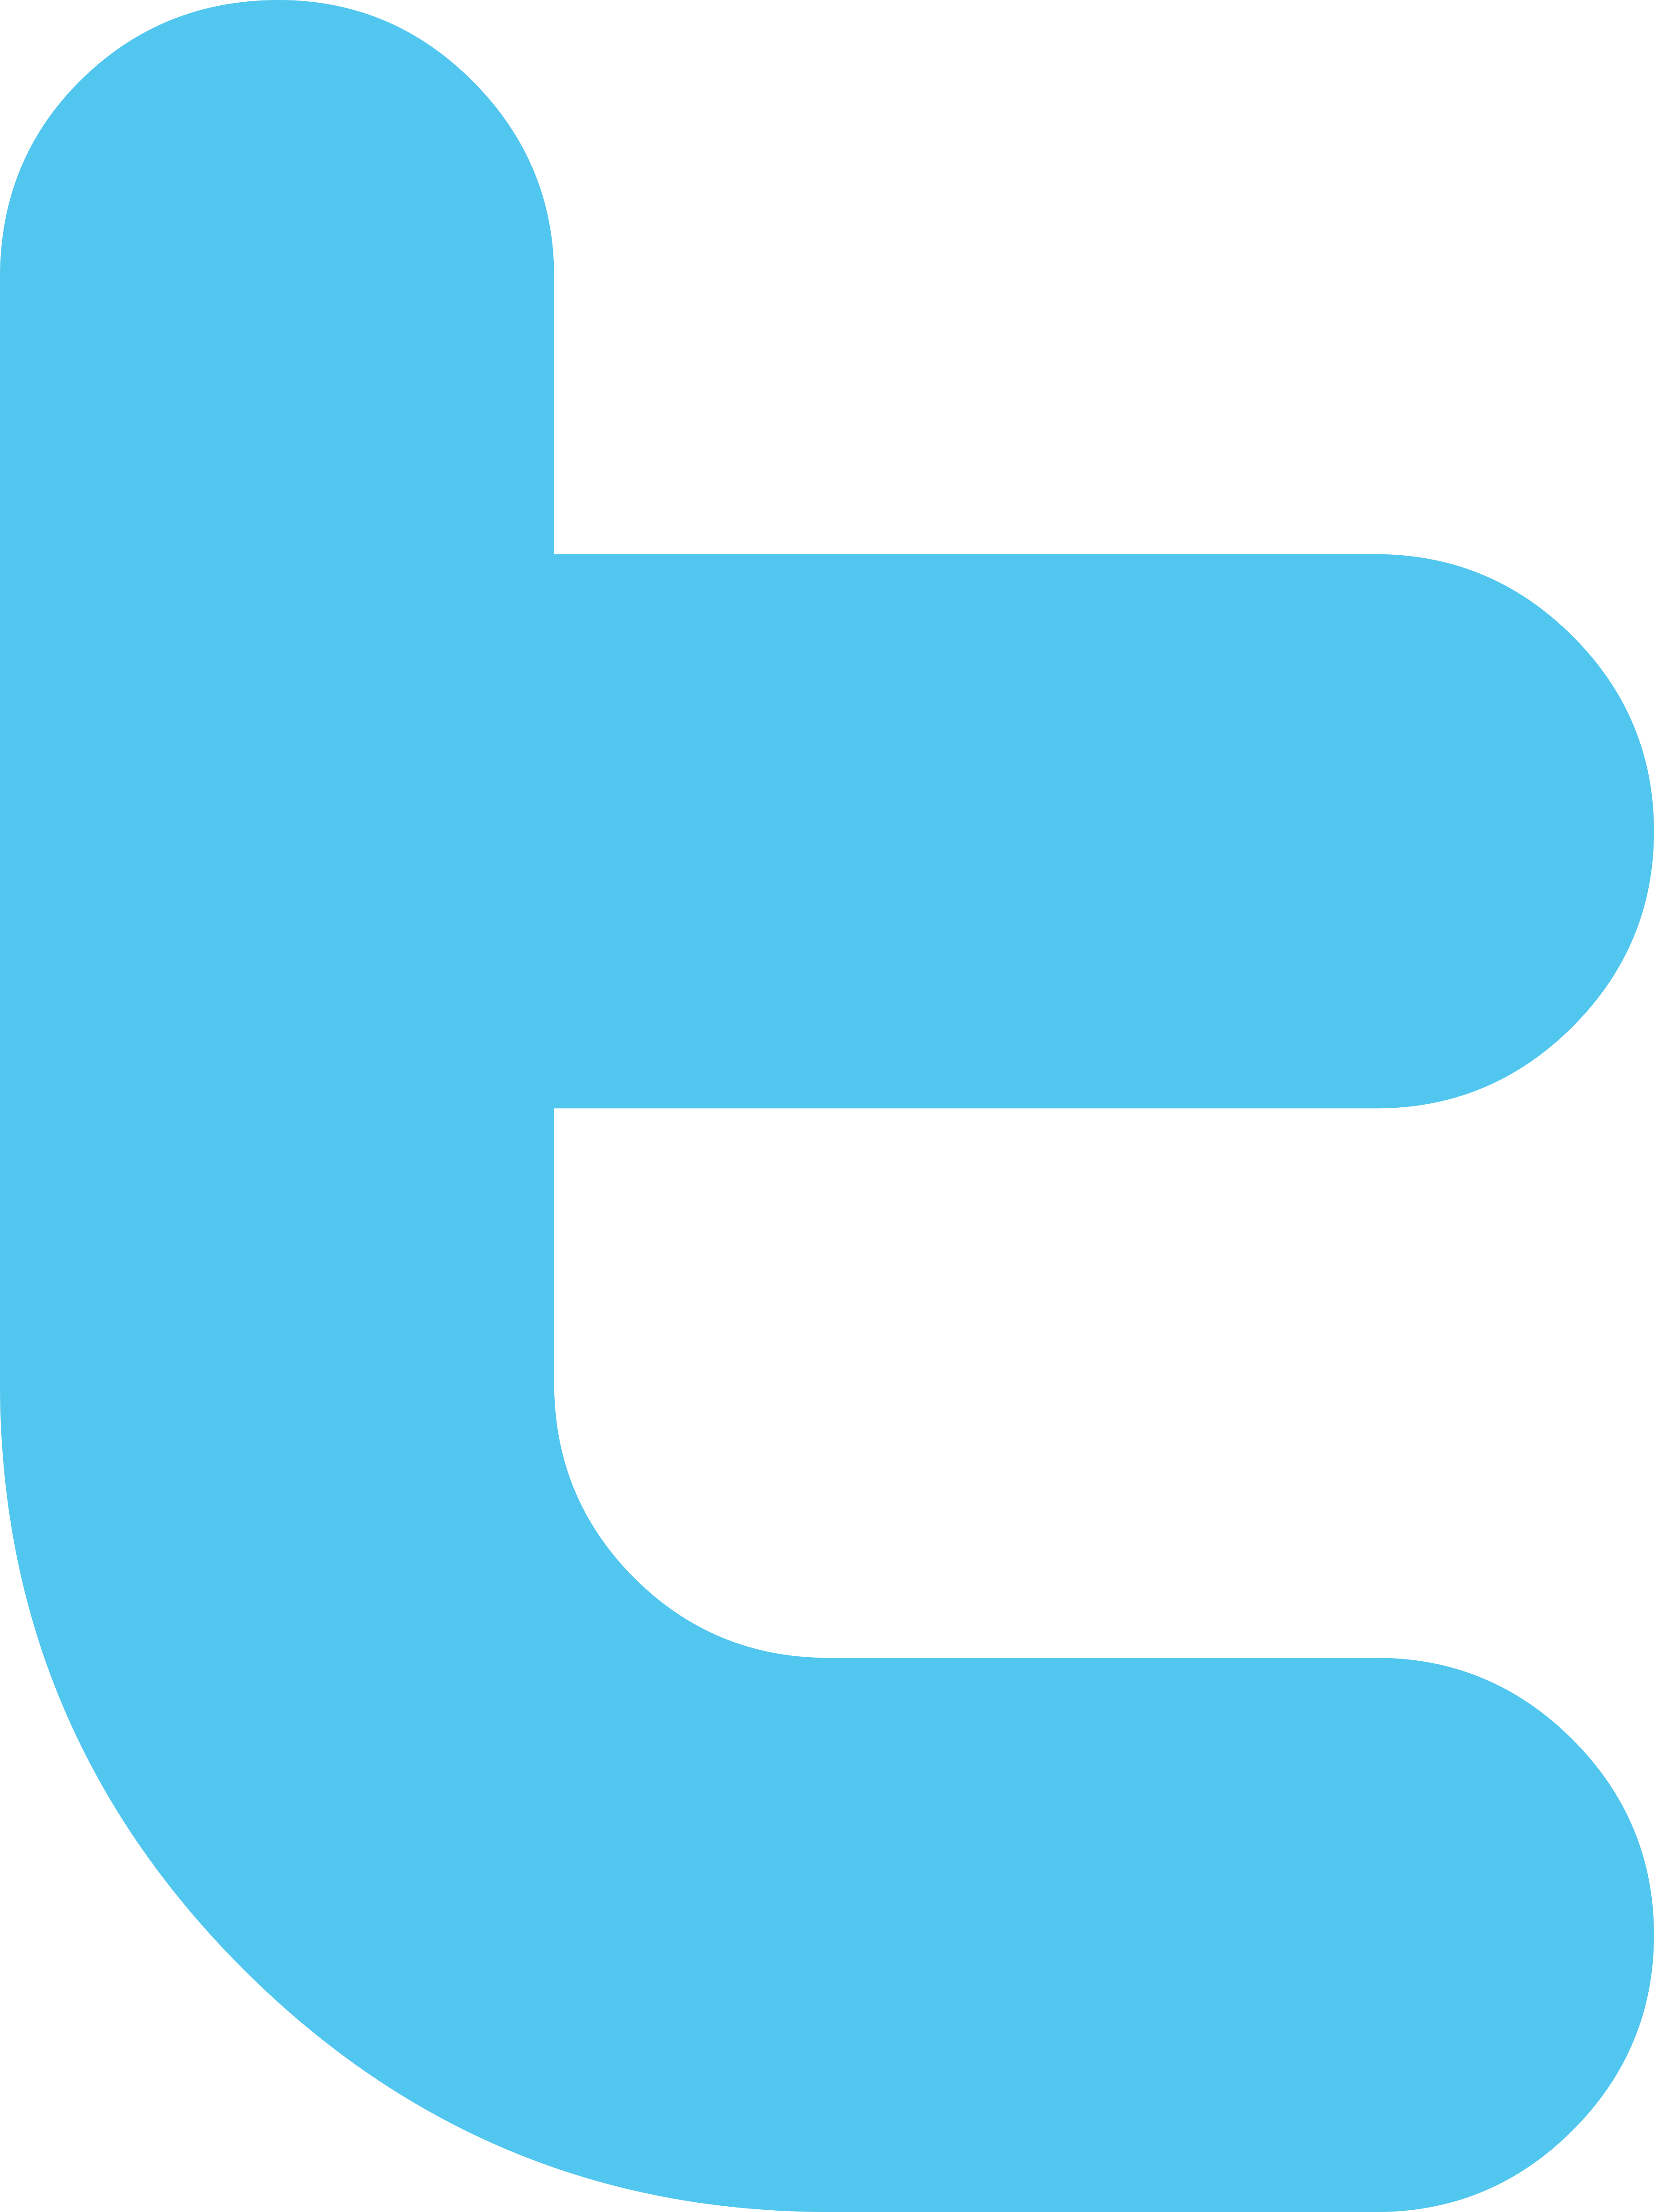 https://logos-download.com/wp-content/uploads/2016/02/Twitter_Logo.png